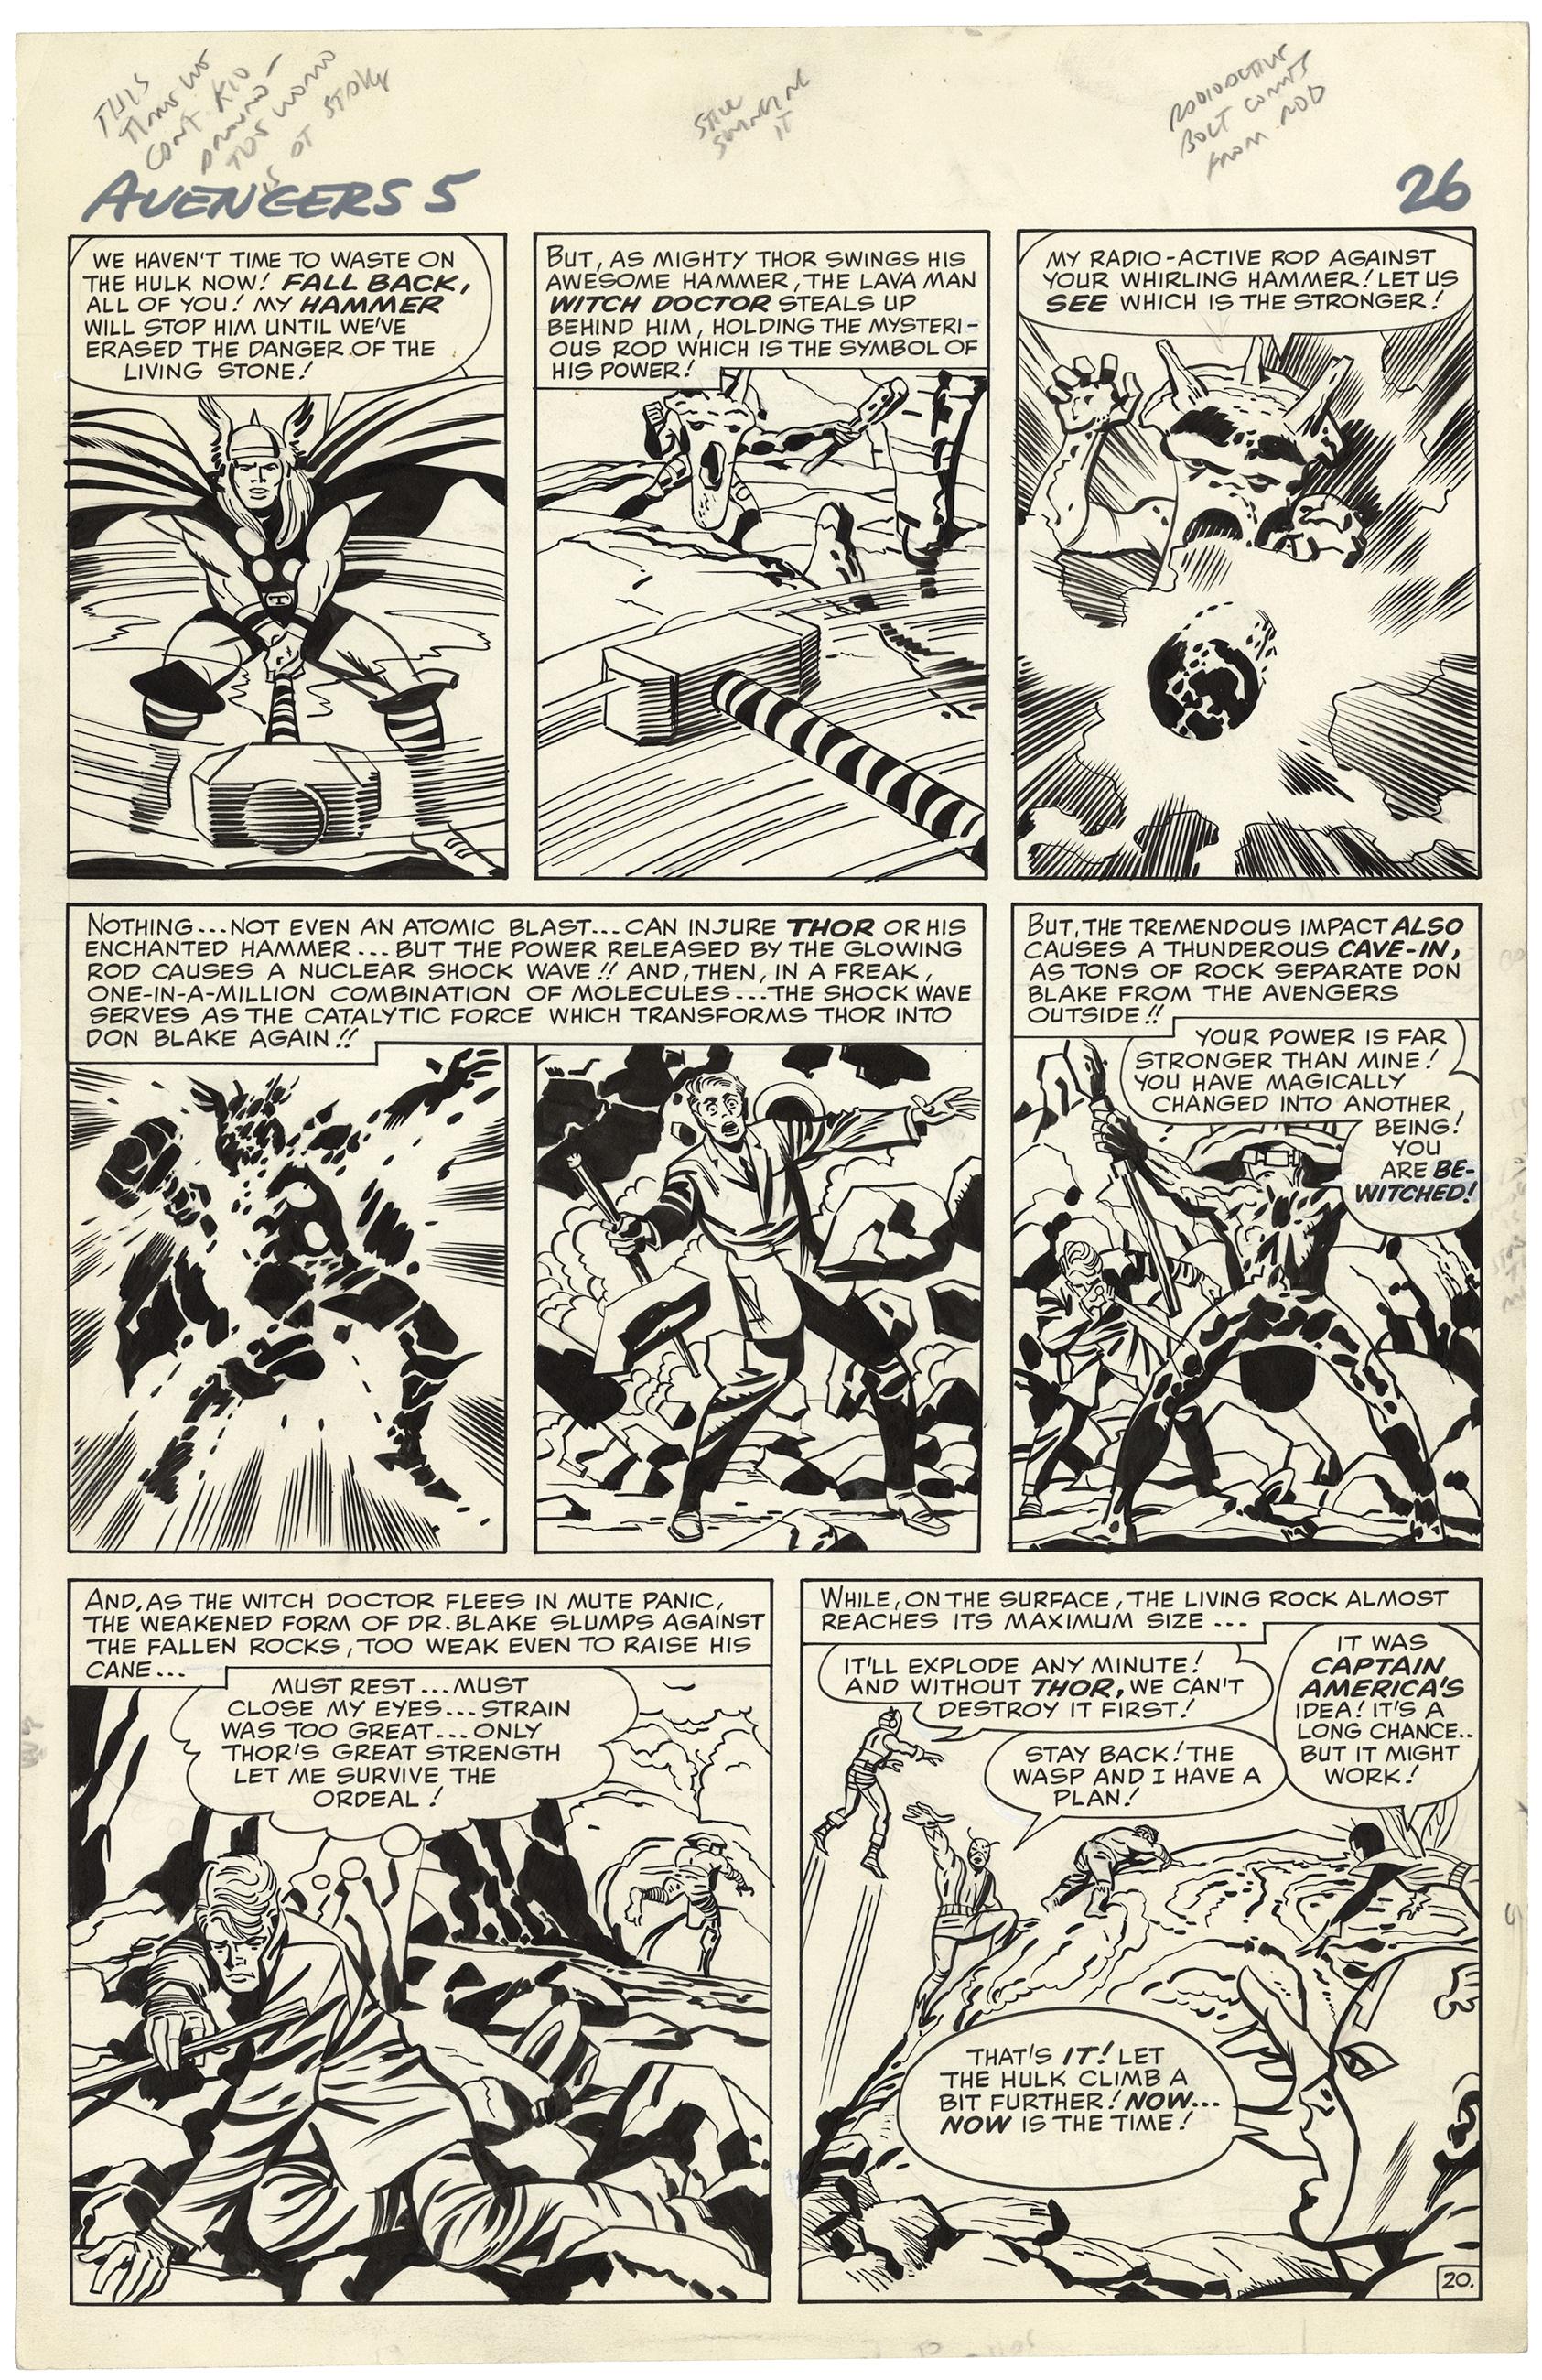 Avengers #5 p20